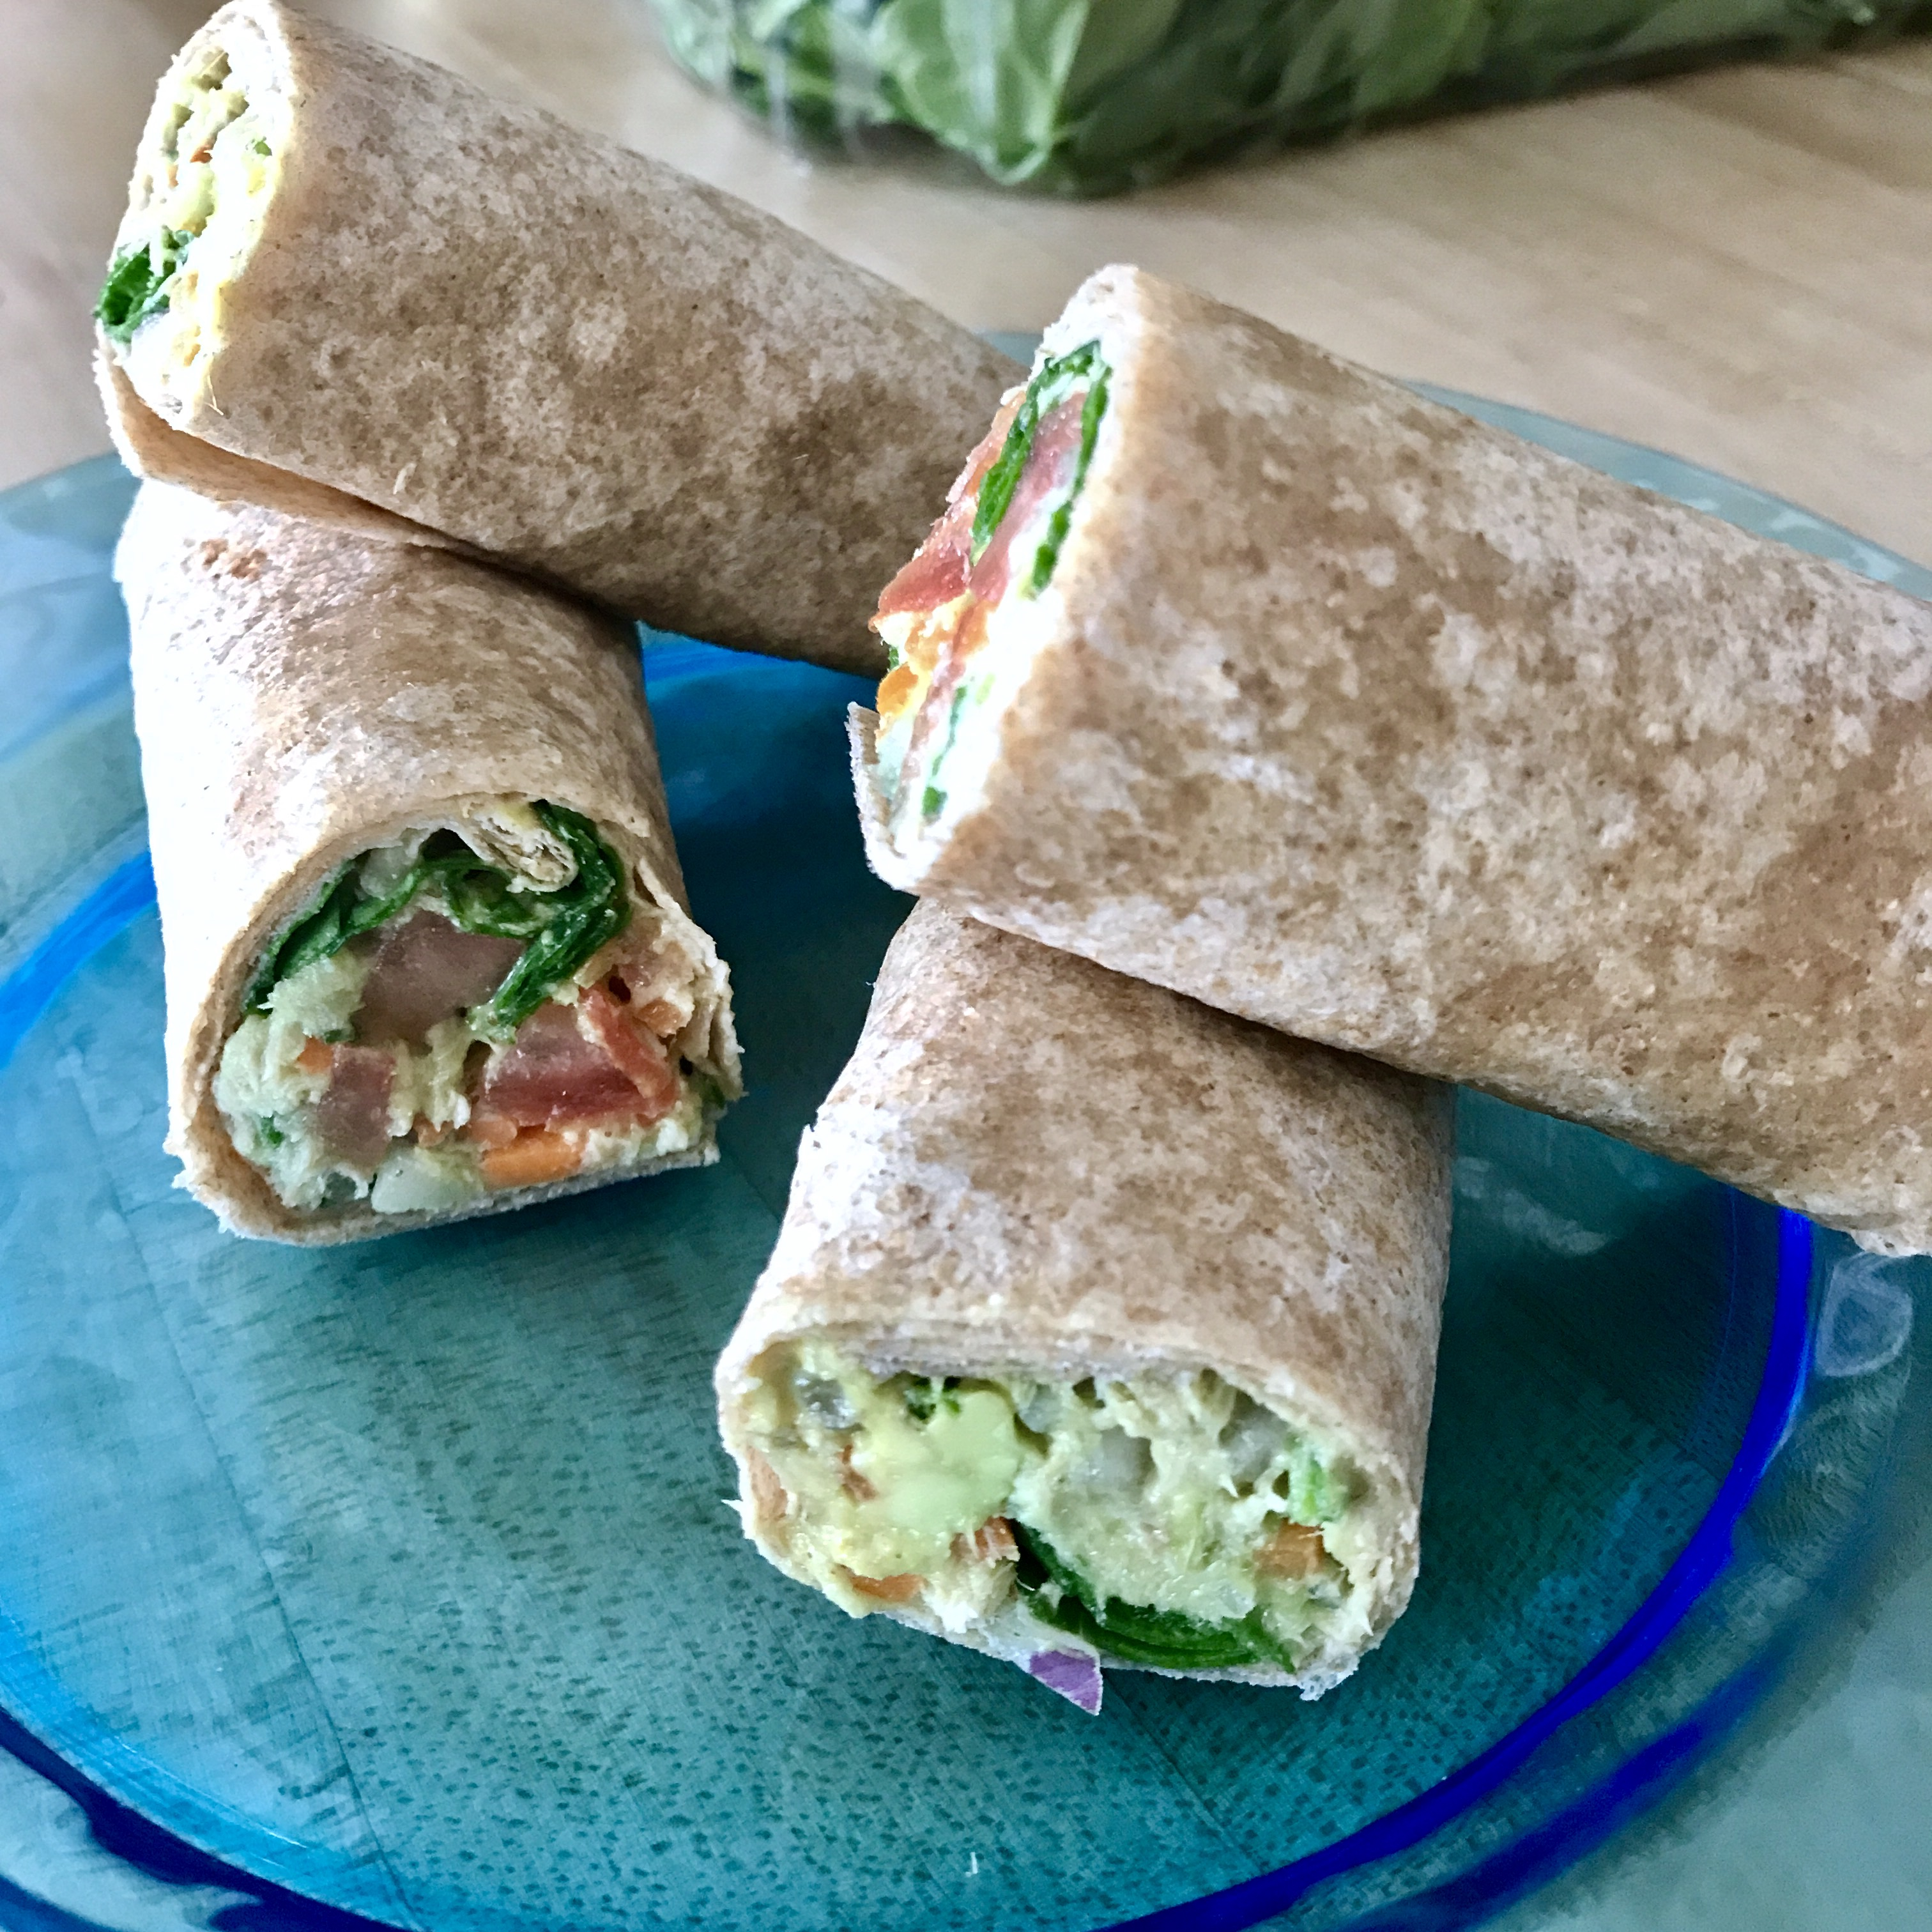 Tuna, Avocado, and Veggies Wrap